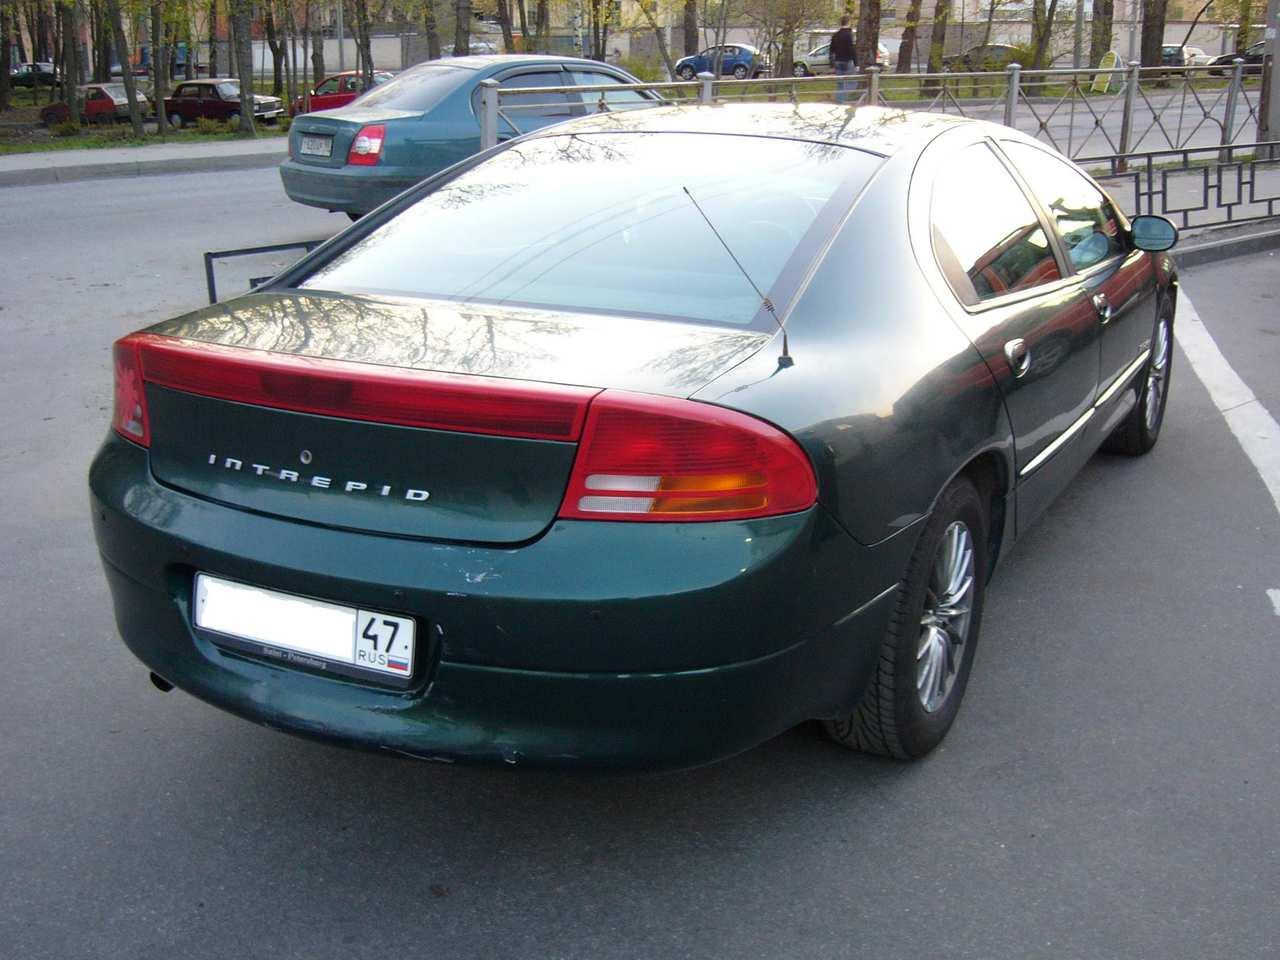 Cronic Used Cars >> Used Honda Inventory In Mcdonough Ga Used Cars Mcdonough ...